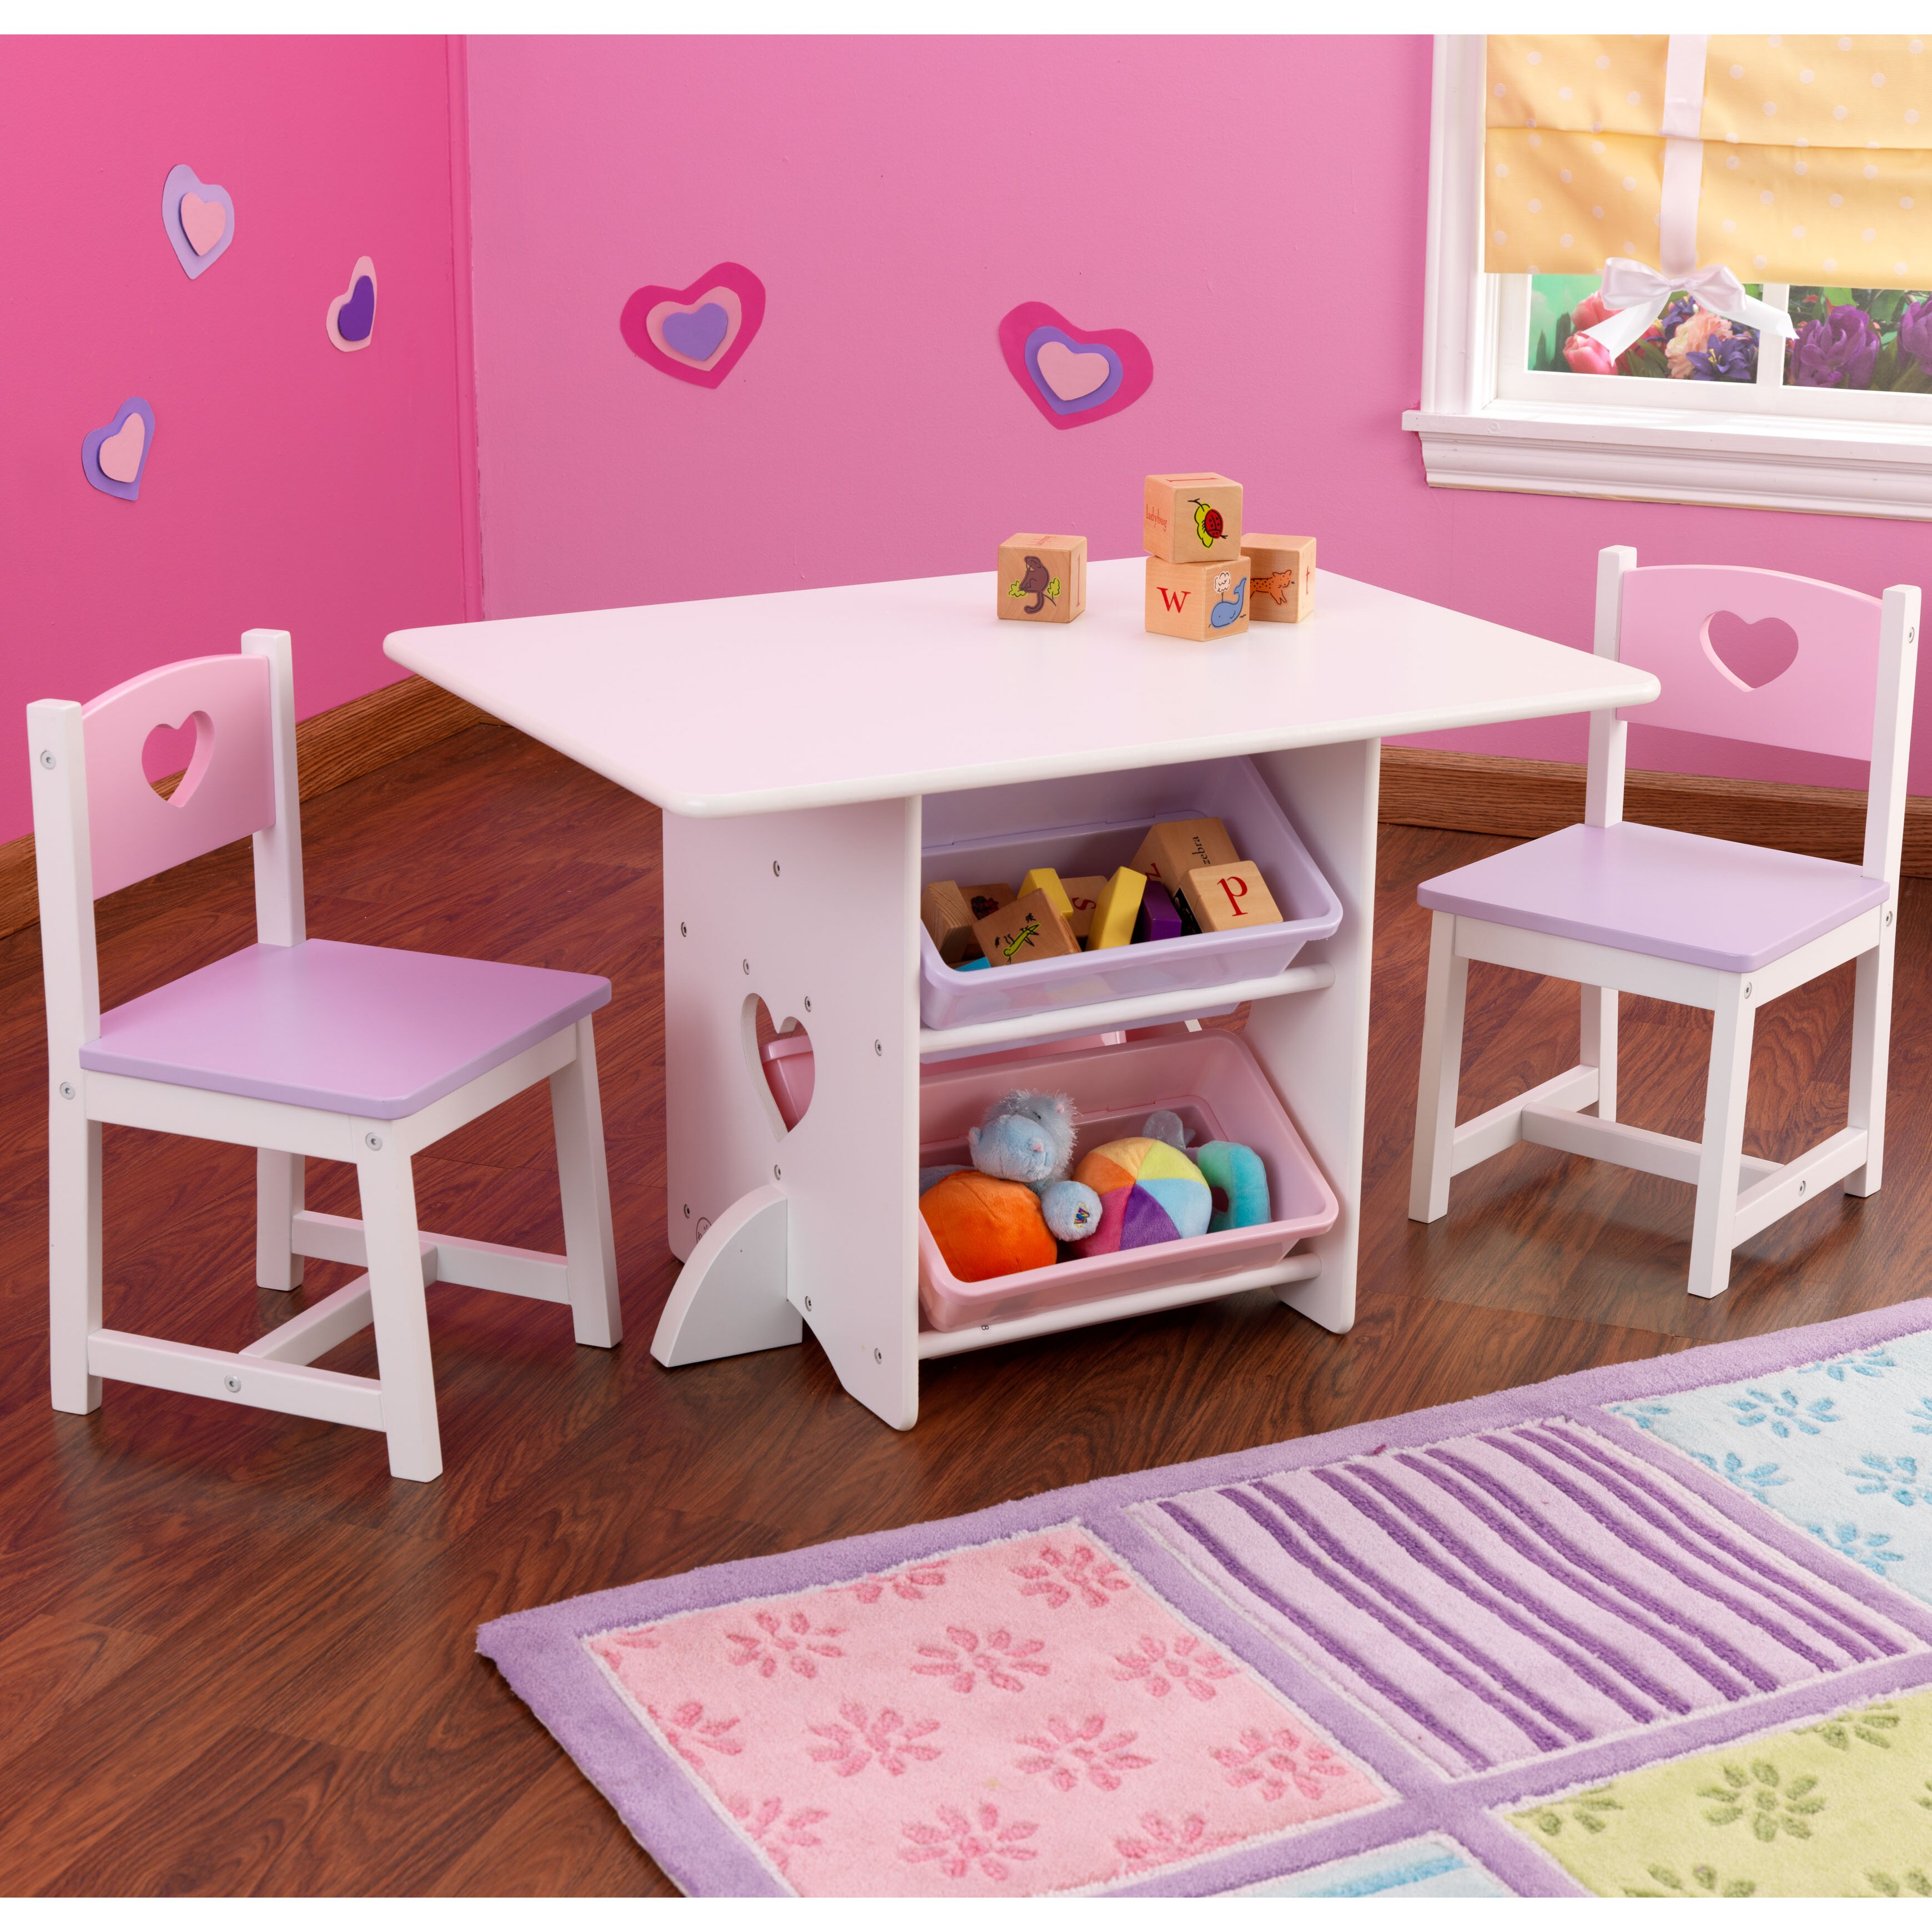 kidkraft 3 tlg kindertisch und stuhl set reviews von manufacturer. Black Bedroom Furniture Sets. Home Design Ideas